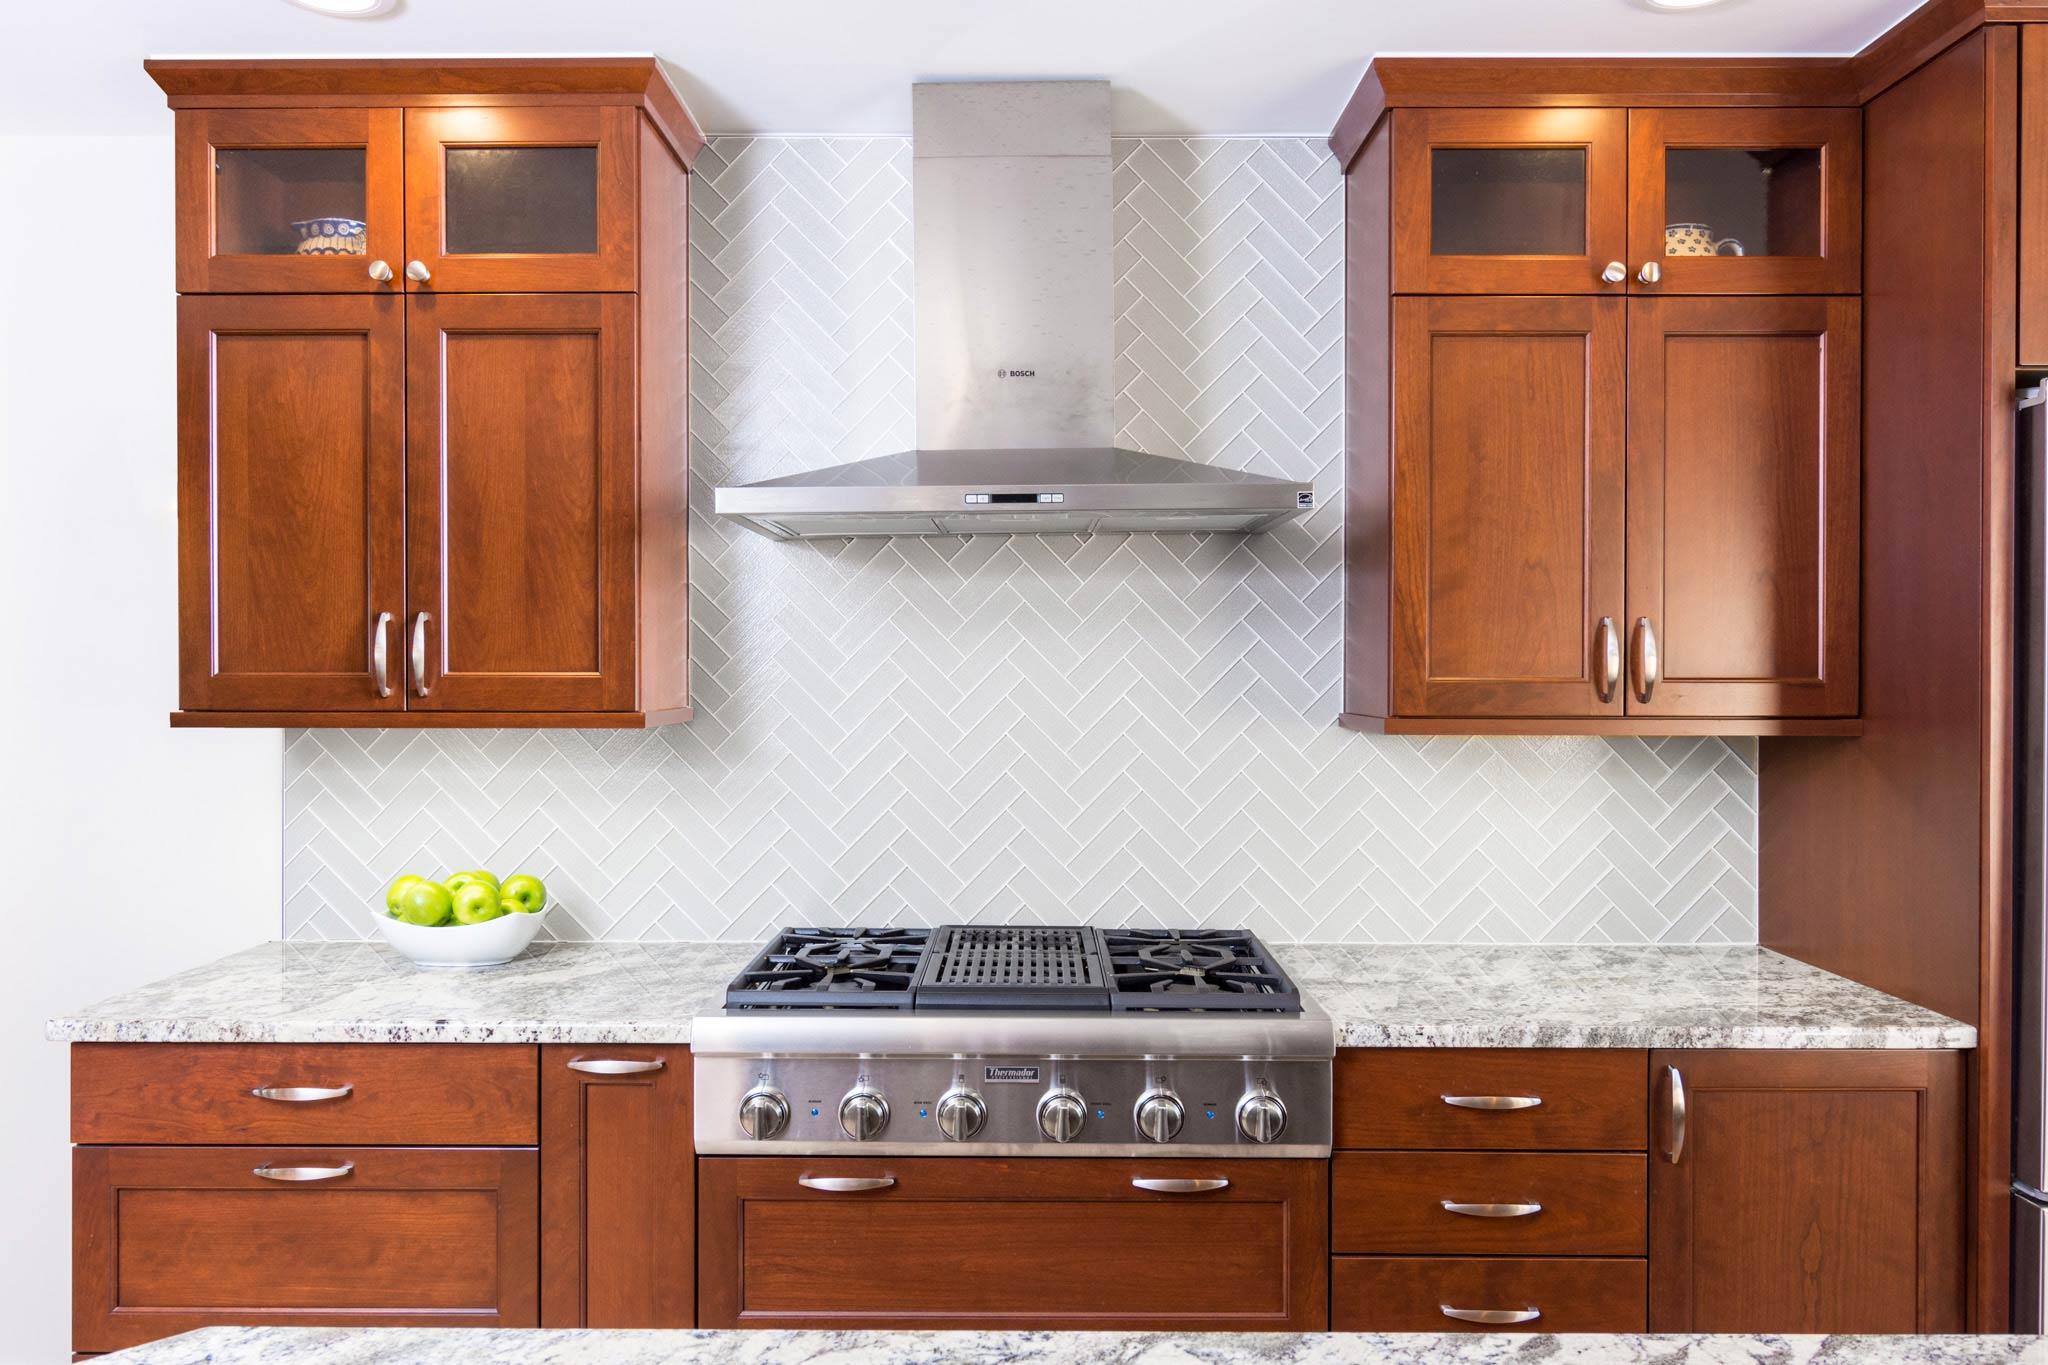 shaker-cabinets-and-glass-tile-backsplash-herringbone.jpg